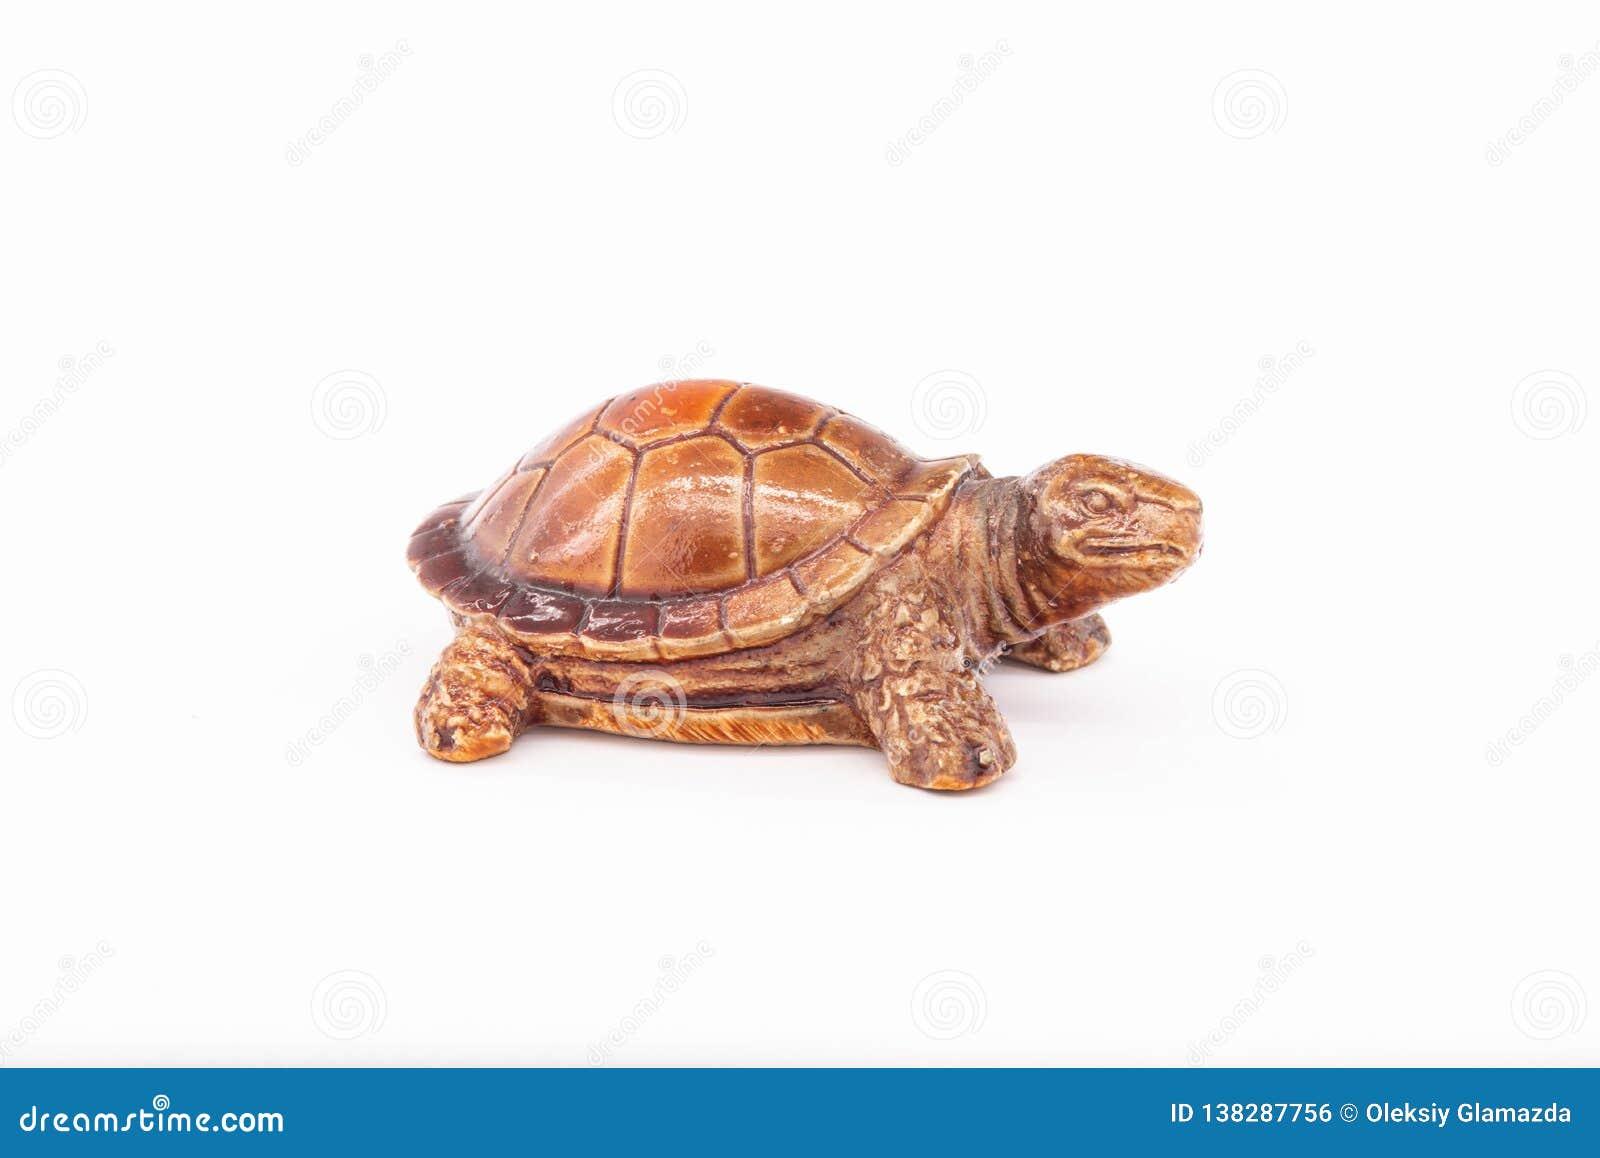 A little toy is a tortoise